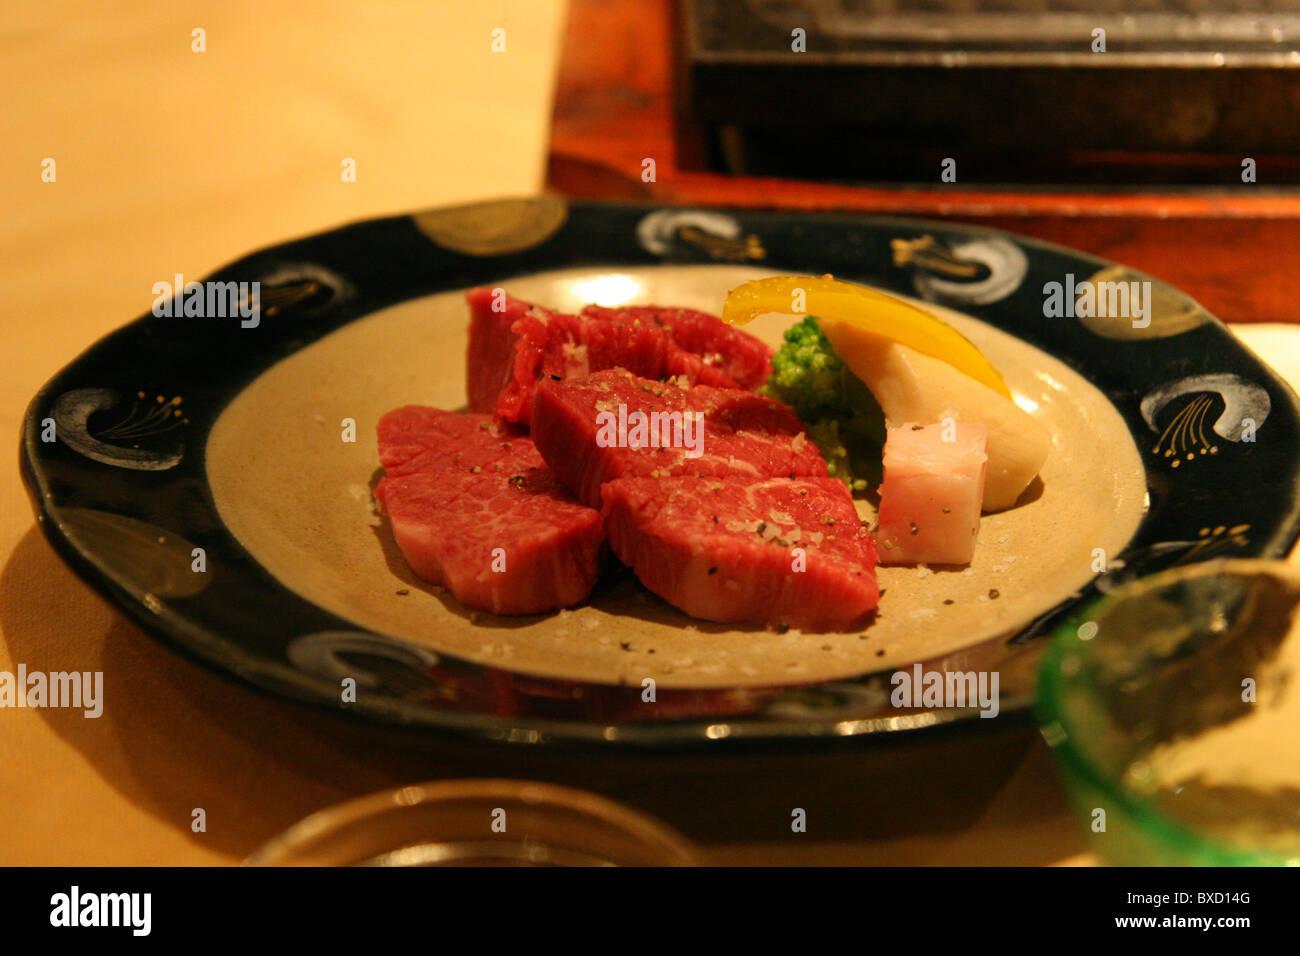 Kobe Kyoto Stock Photos & Kobe Kyoto Stock Images - Alamy